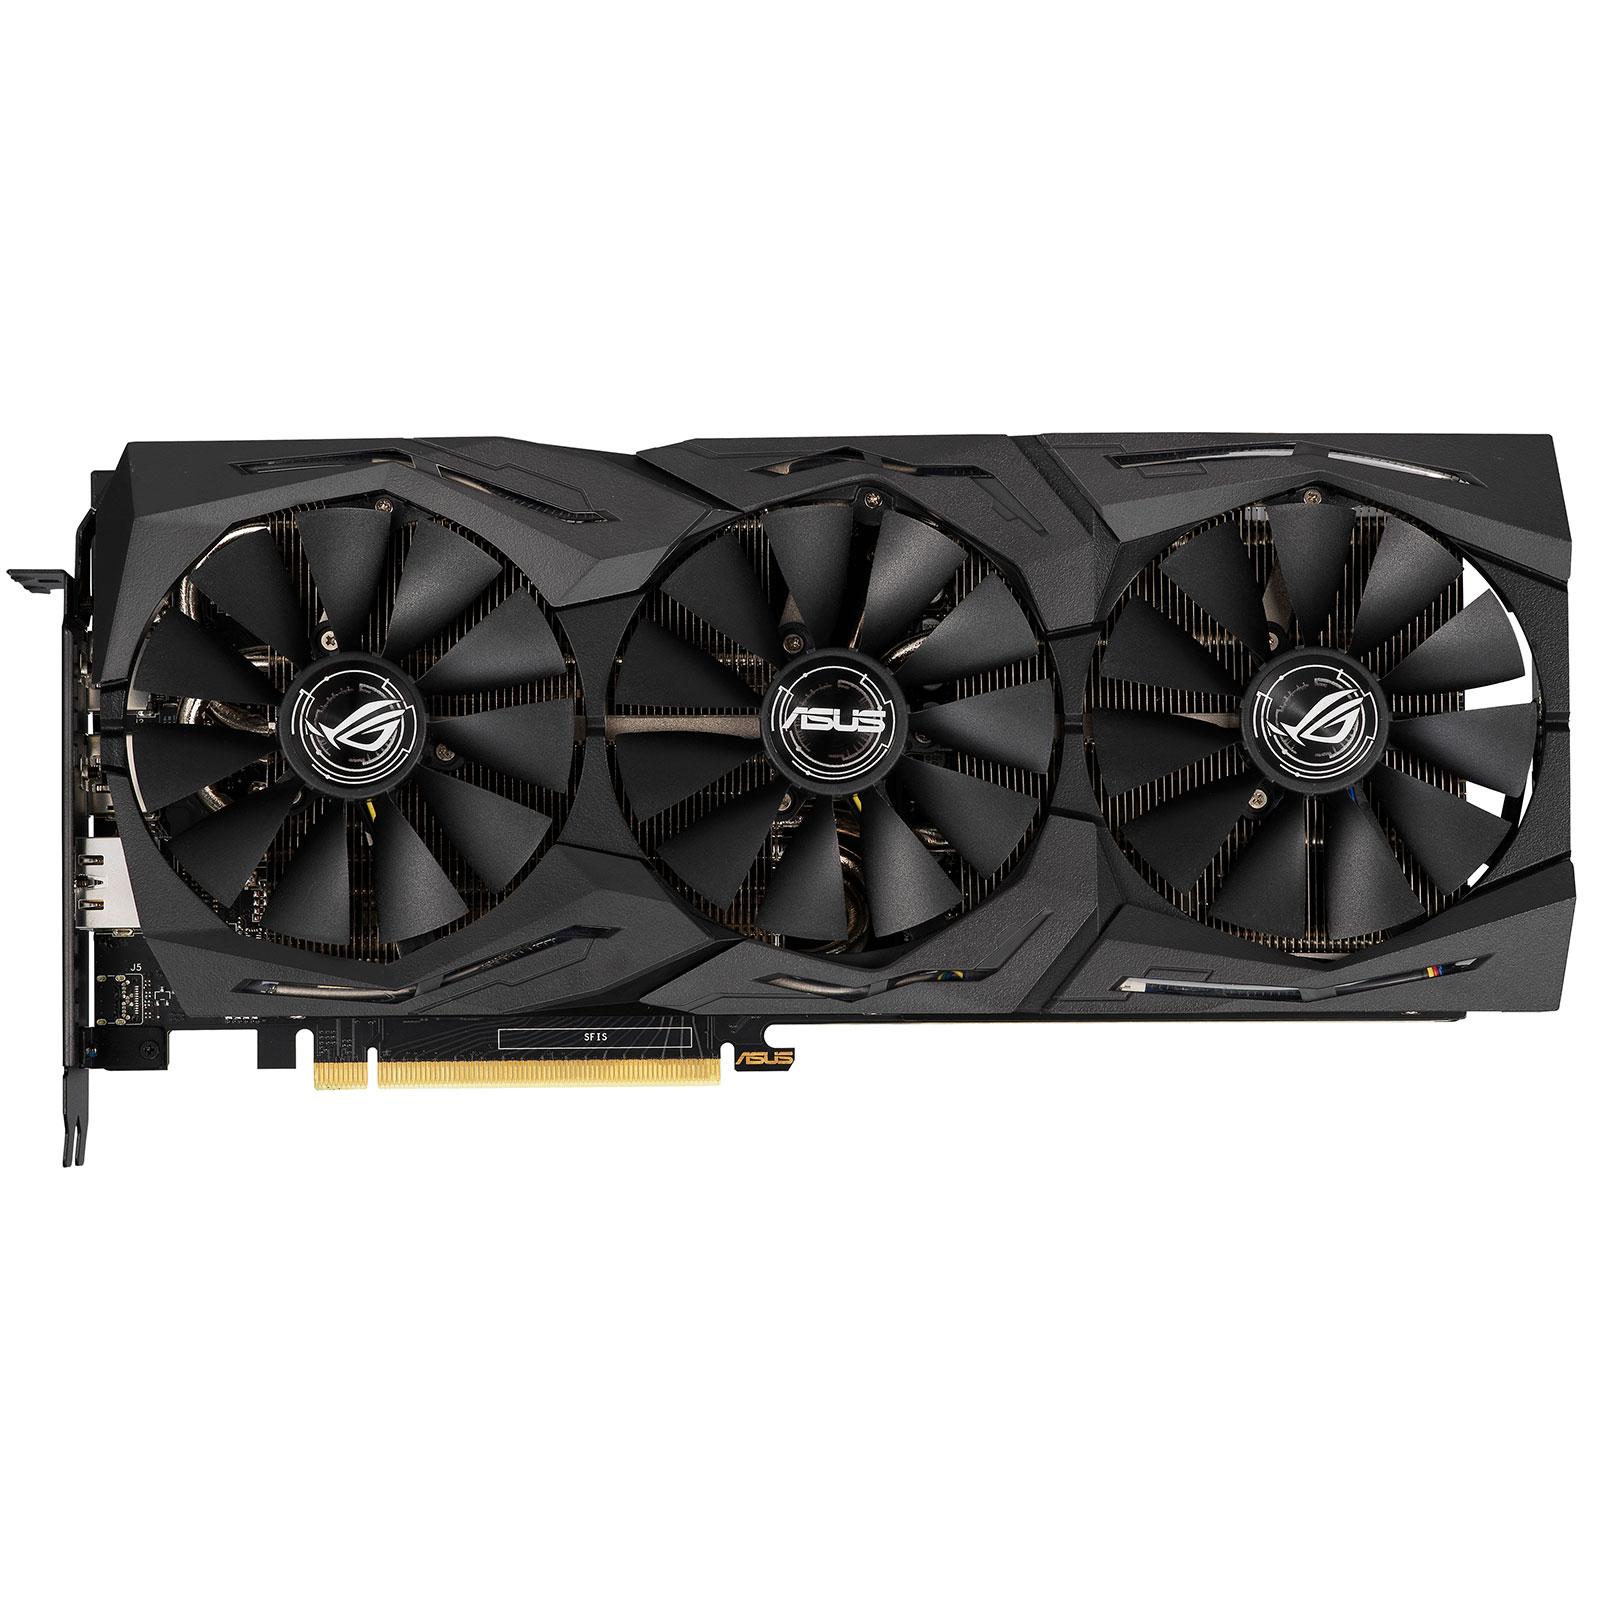 ROG Strix GeForce RTX 2060 OC Edition 6GB GDDR6 (90YV0CI0-M0NA00) - Achat / Vente Carte graphique sur Picata.fr - 4